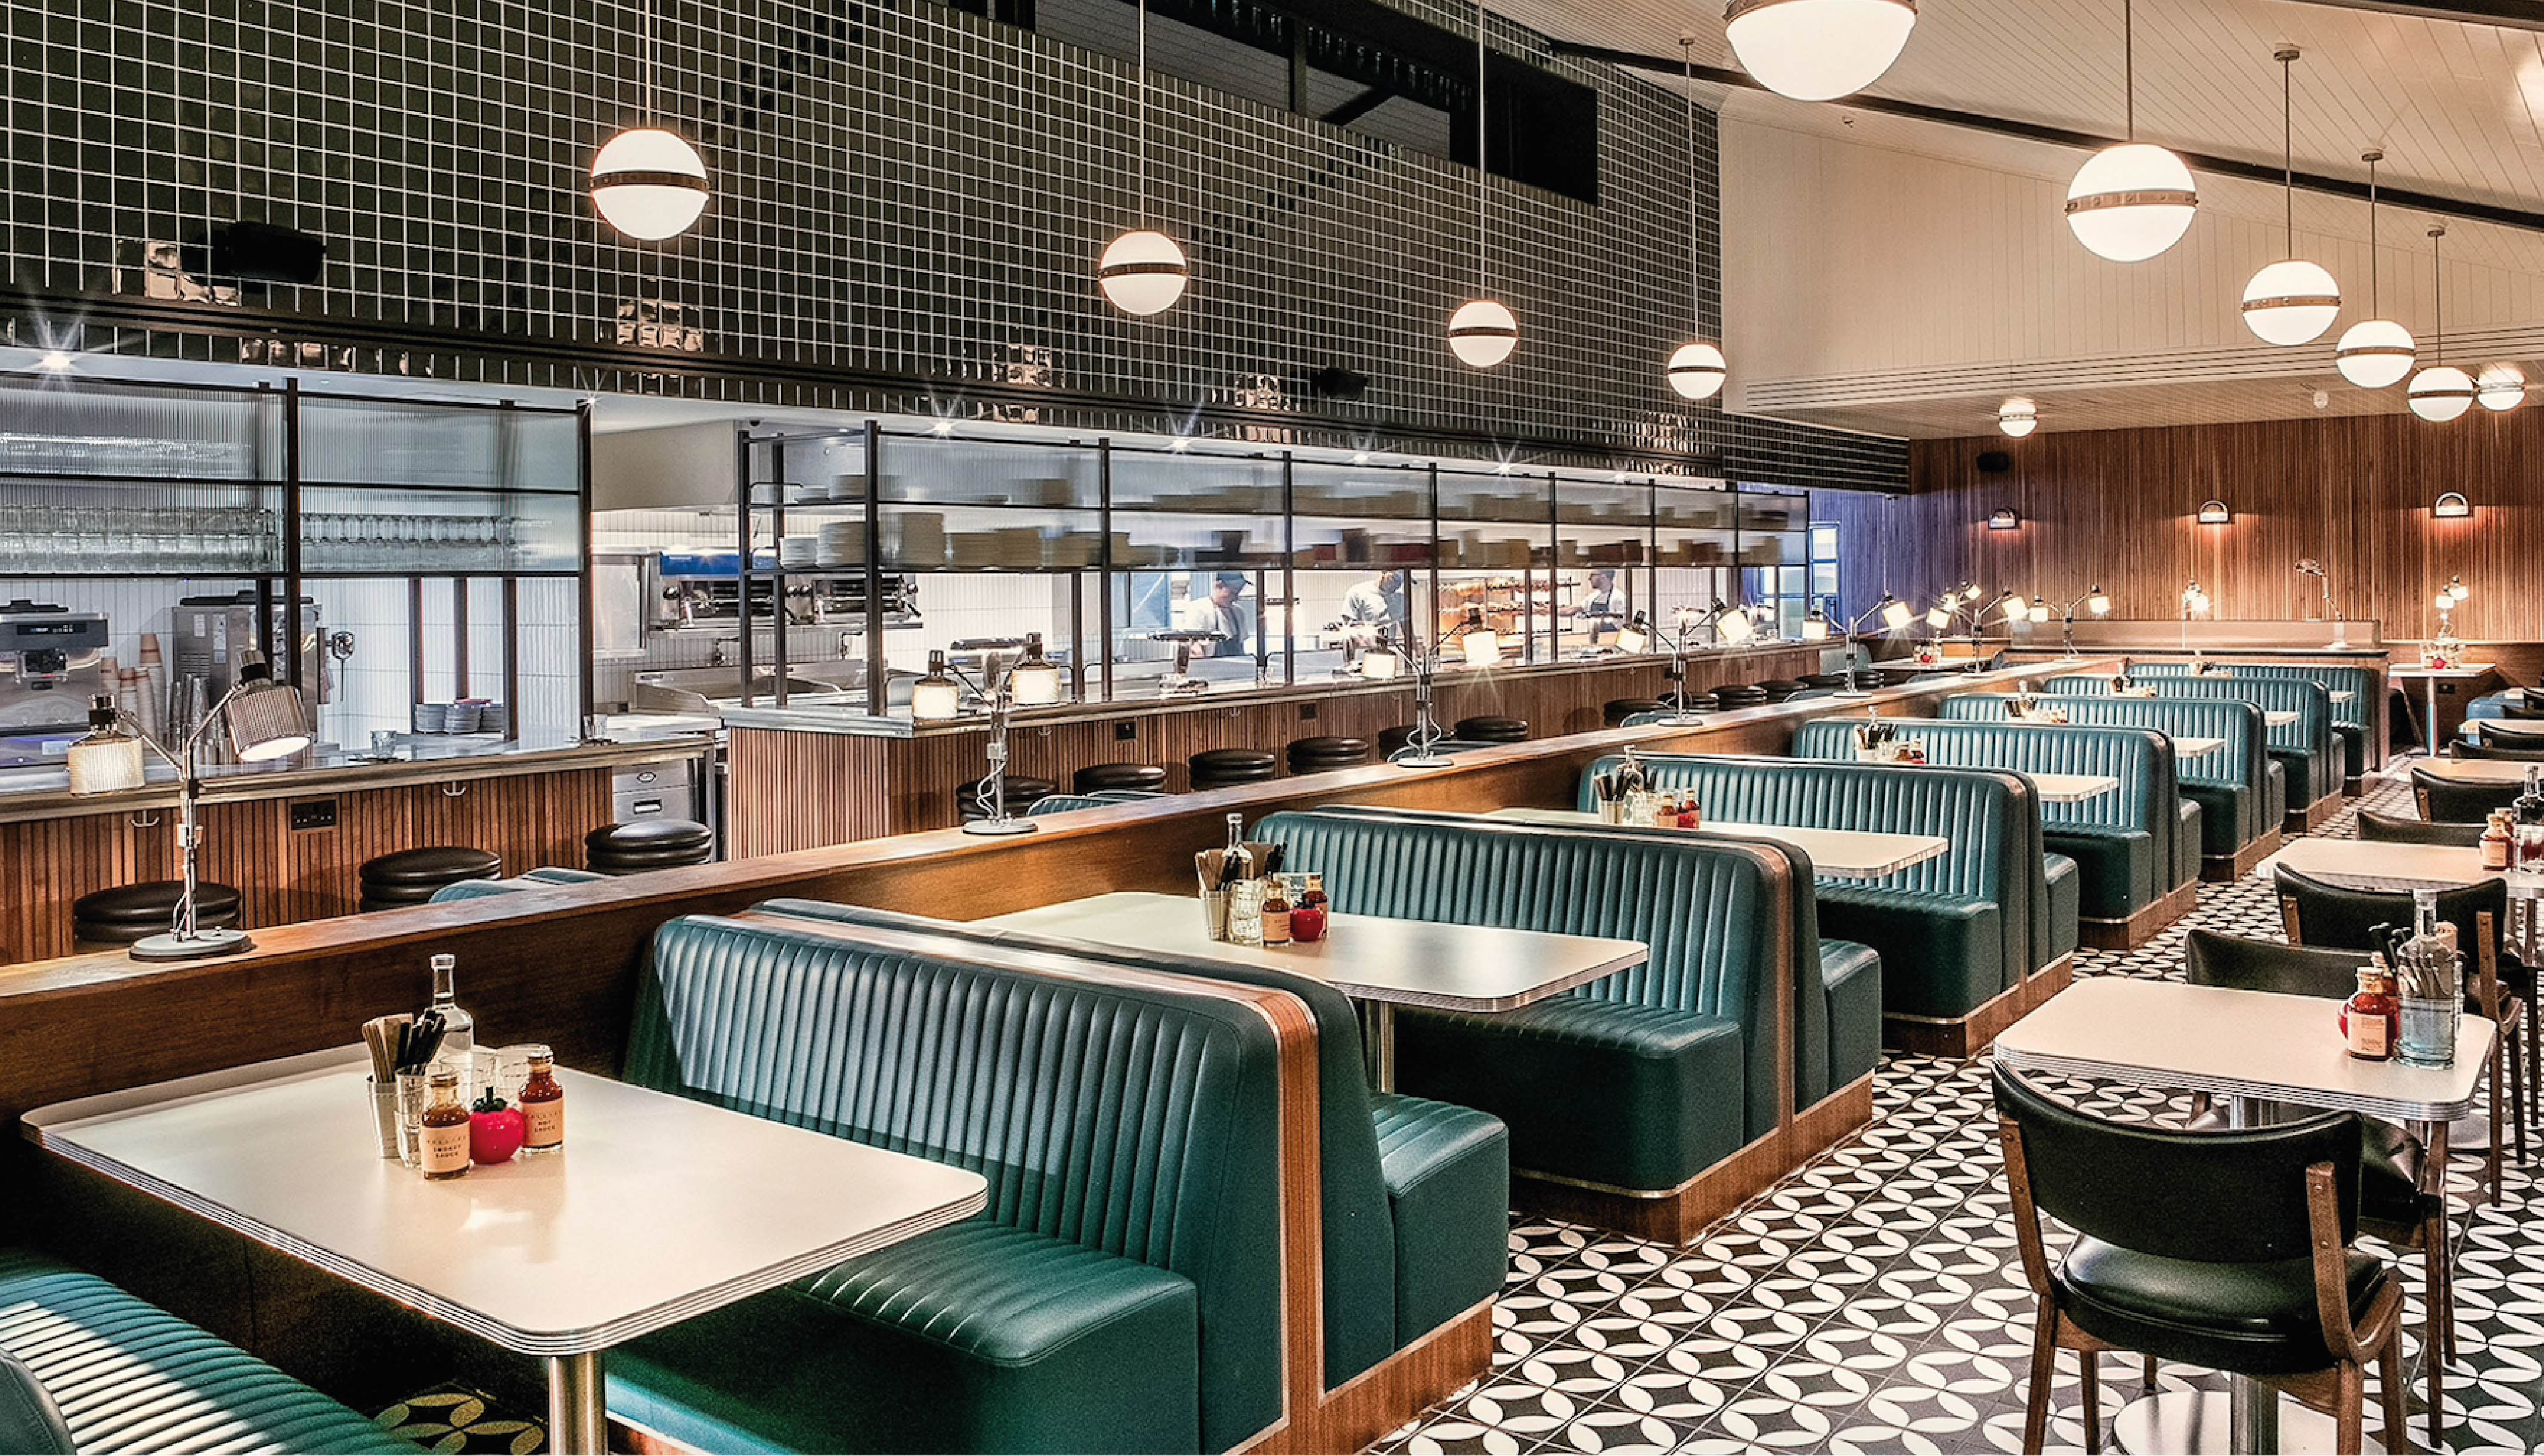 Nova Interiors Mollie's Motel & Diner